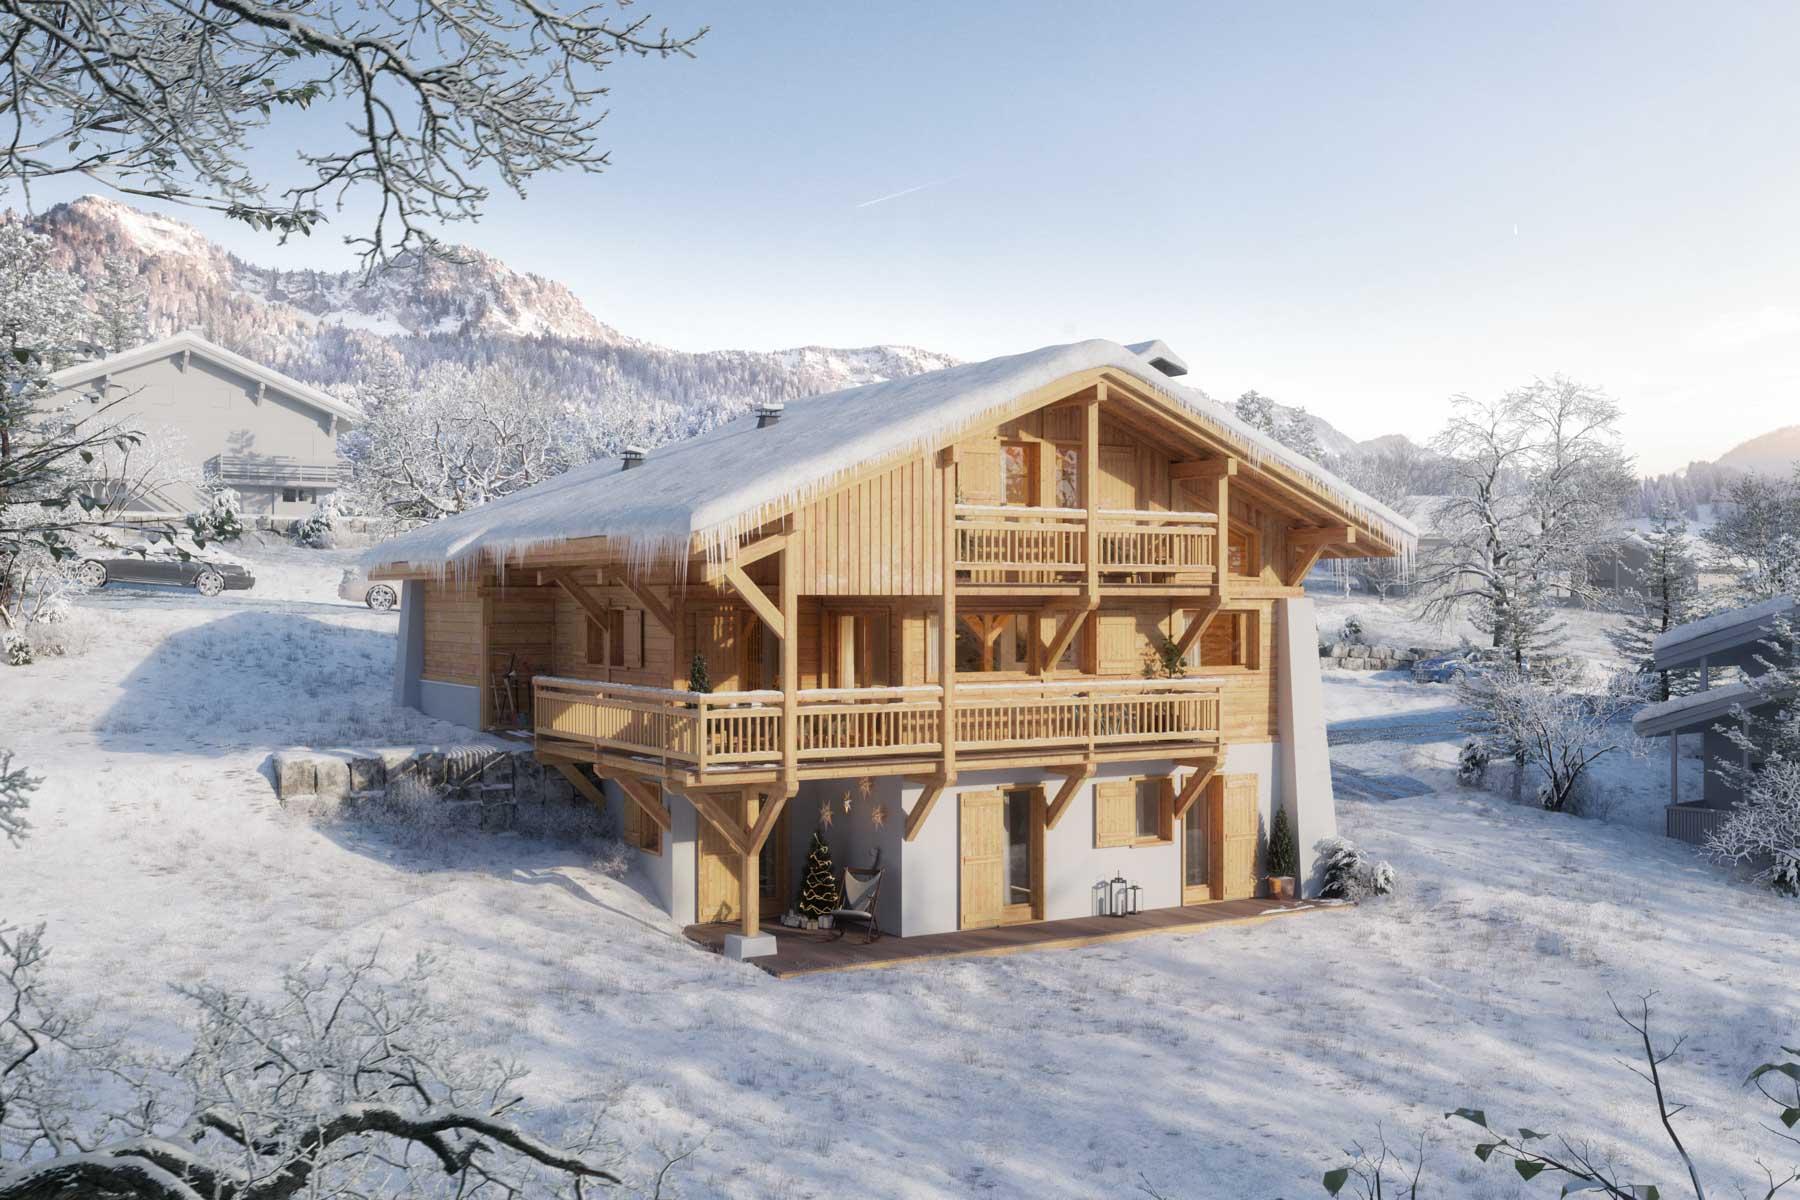 Riches Chalet 289 In snow